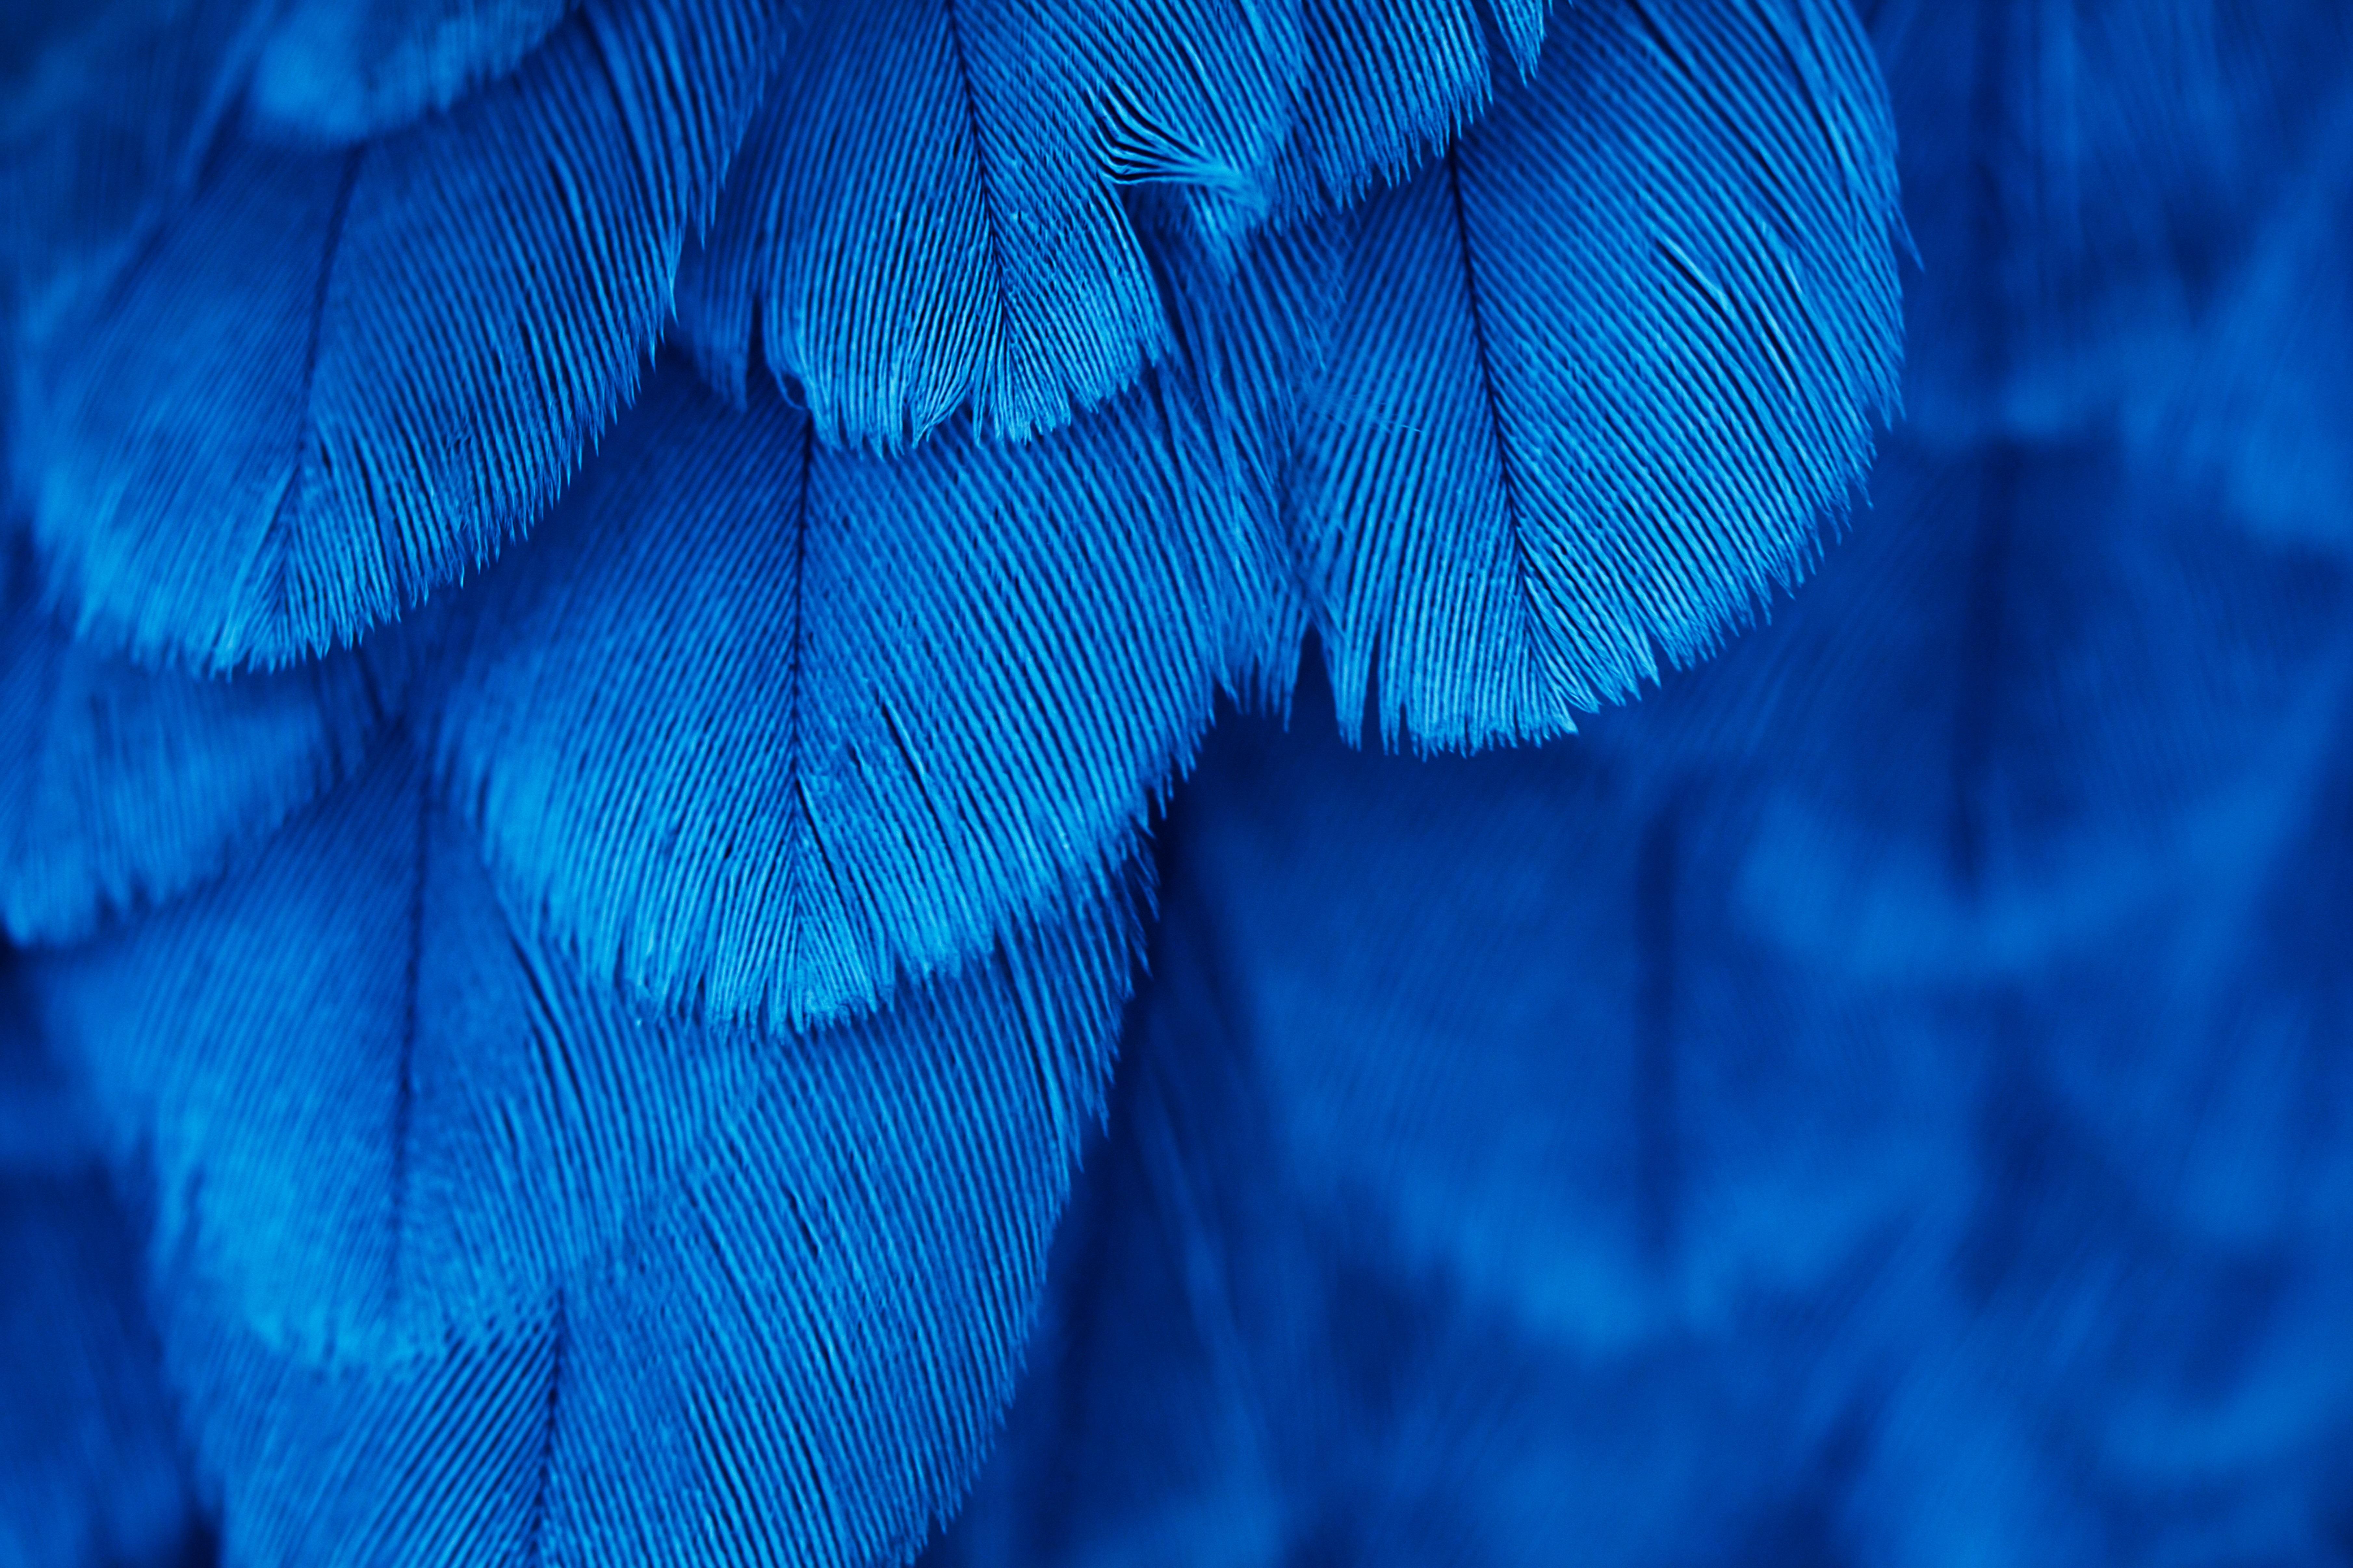 Desktop Wallpapers Blue Feathers Closeup 7240x4826 7240x4826